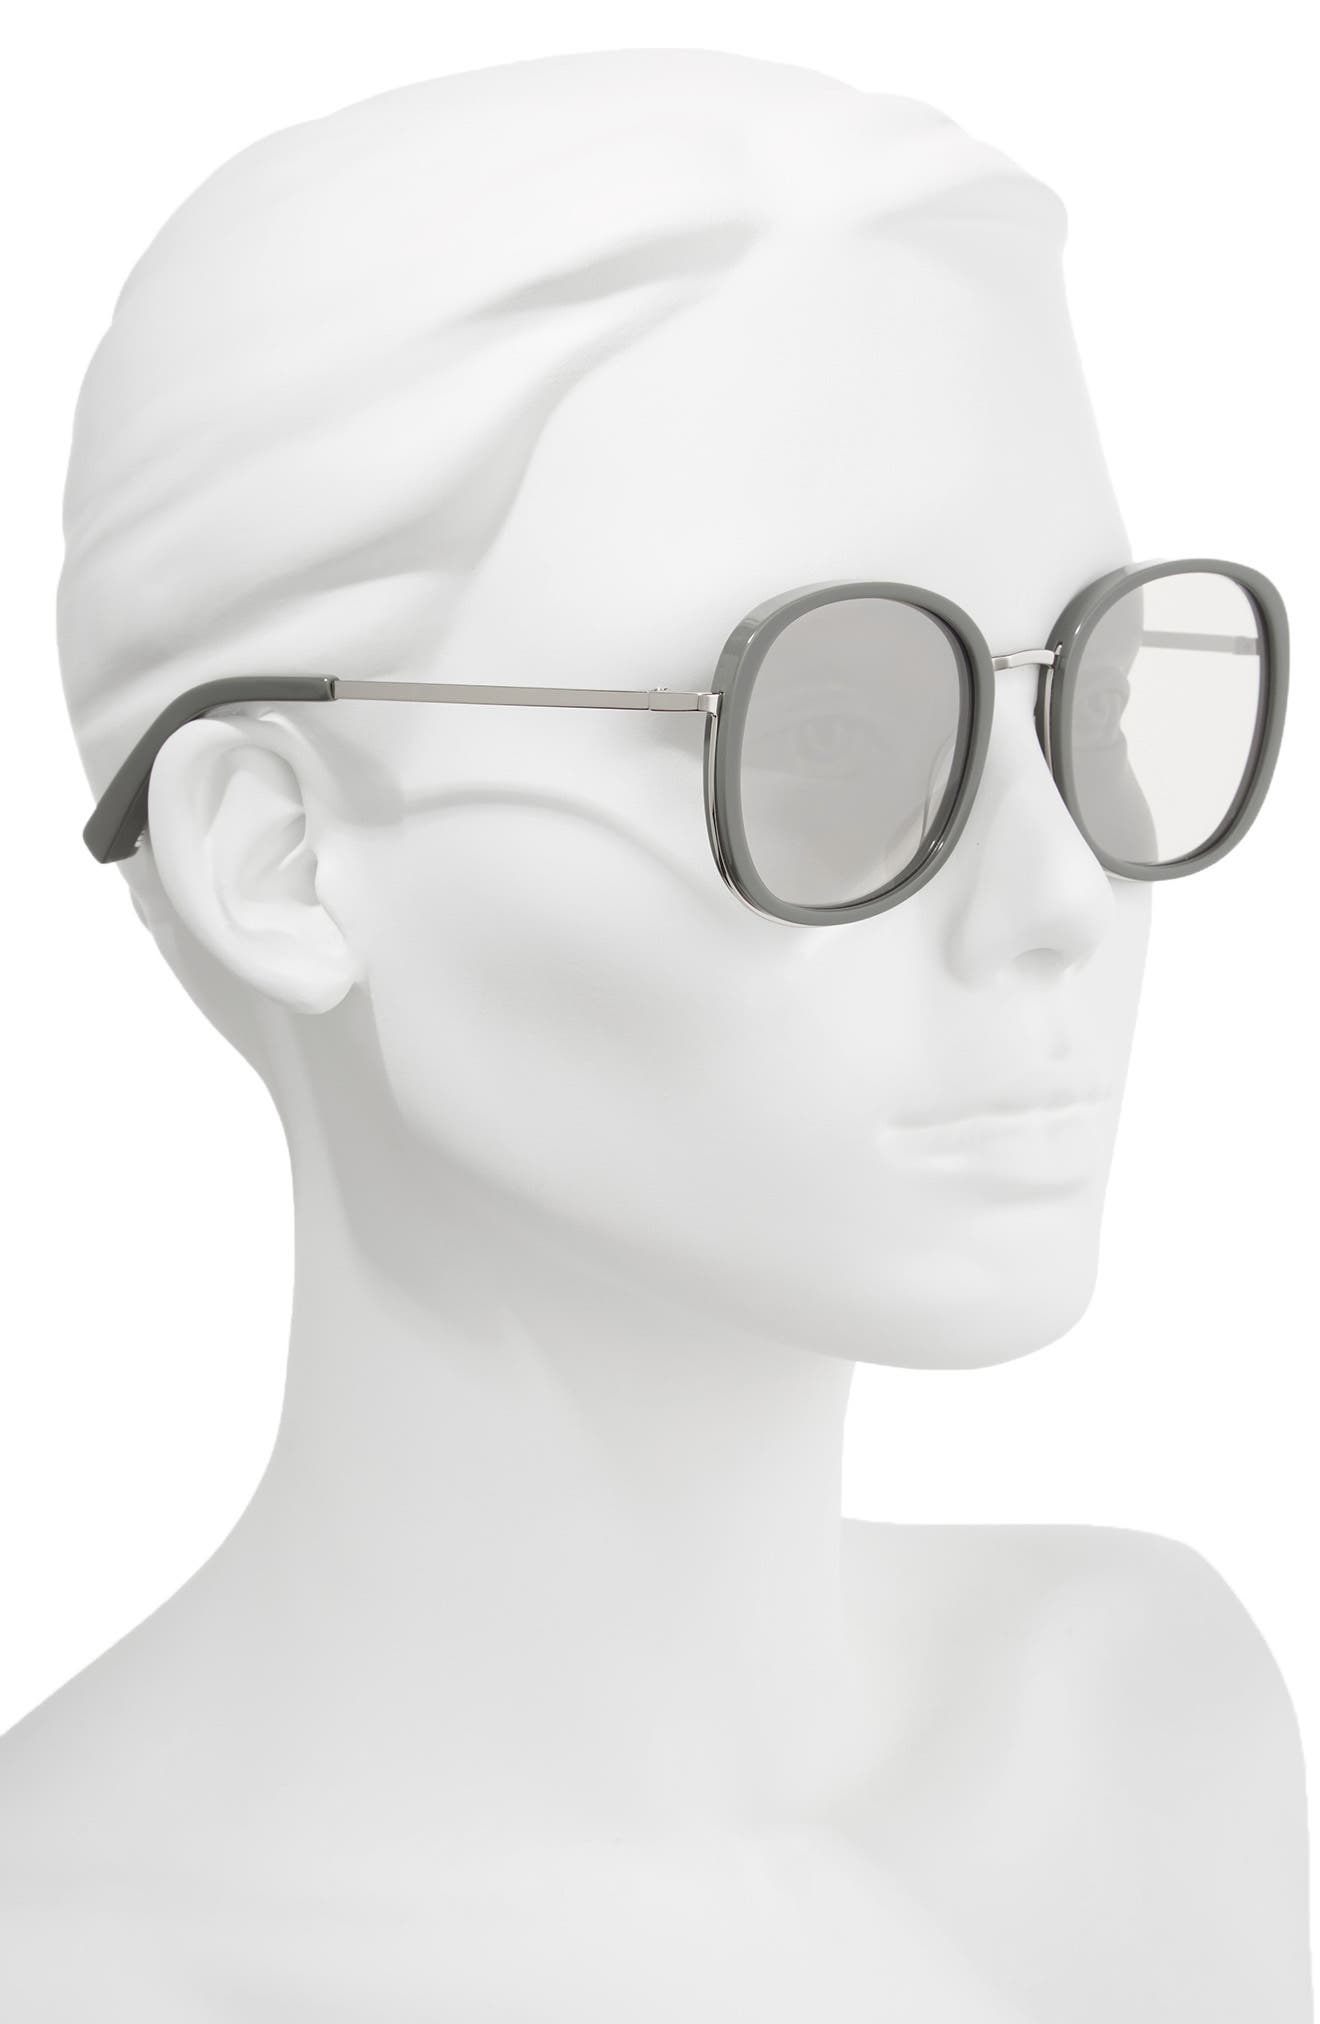 Jones 51mm Round Sunglasses,                             Alternate thumbnail 2, color,                             KHAKI AND SILVER